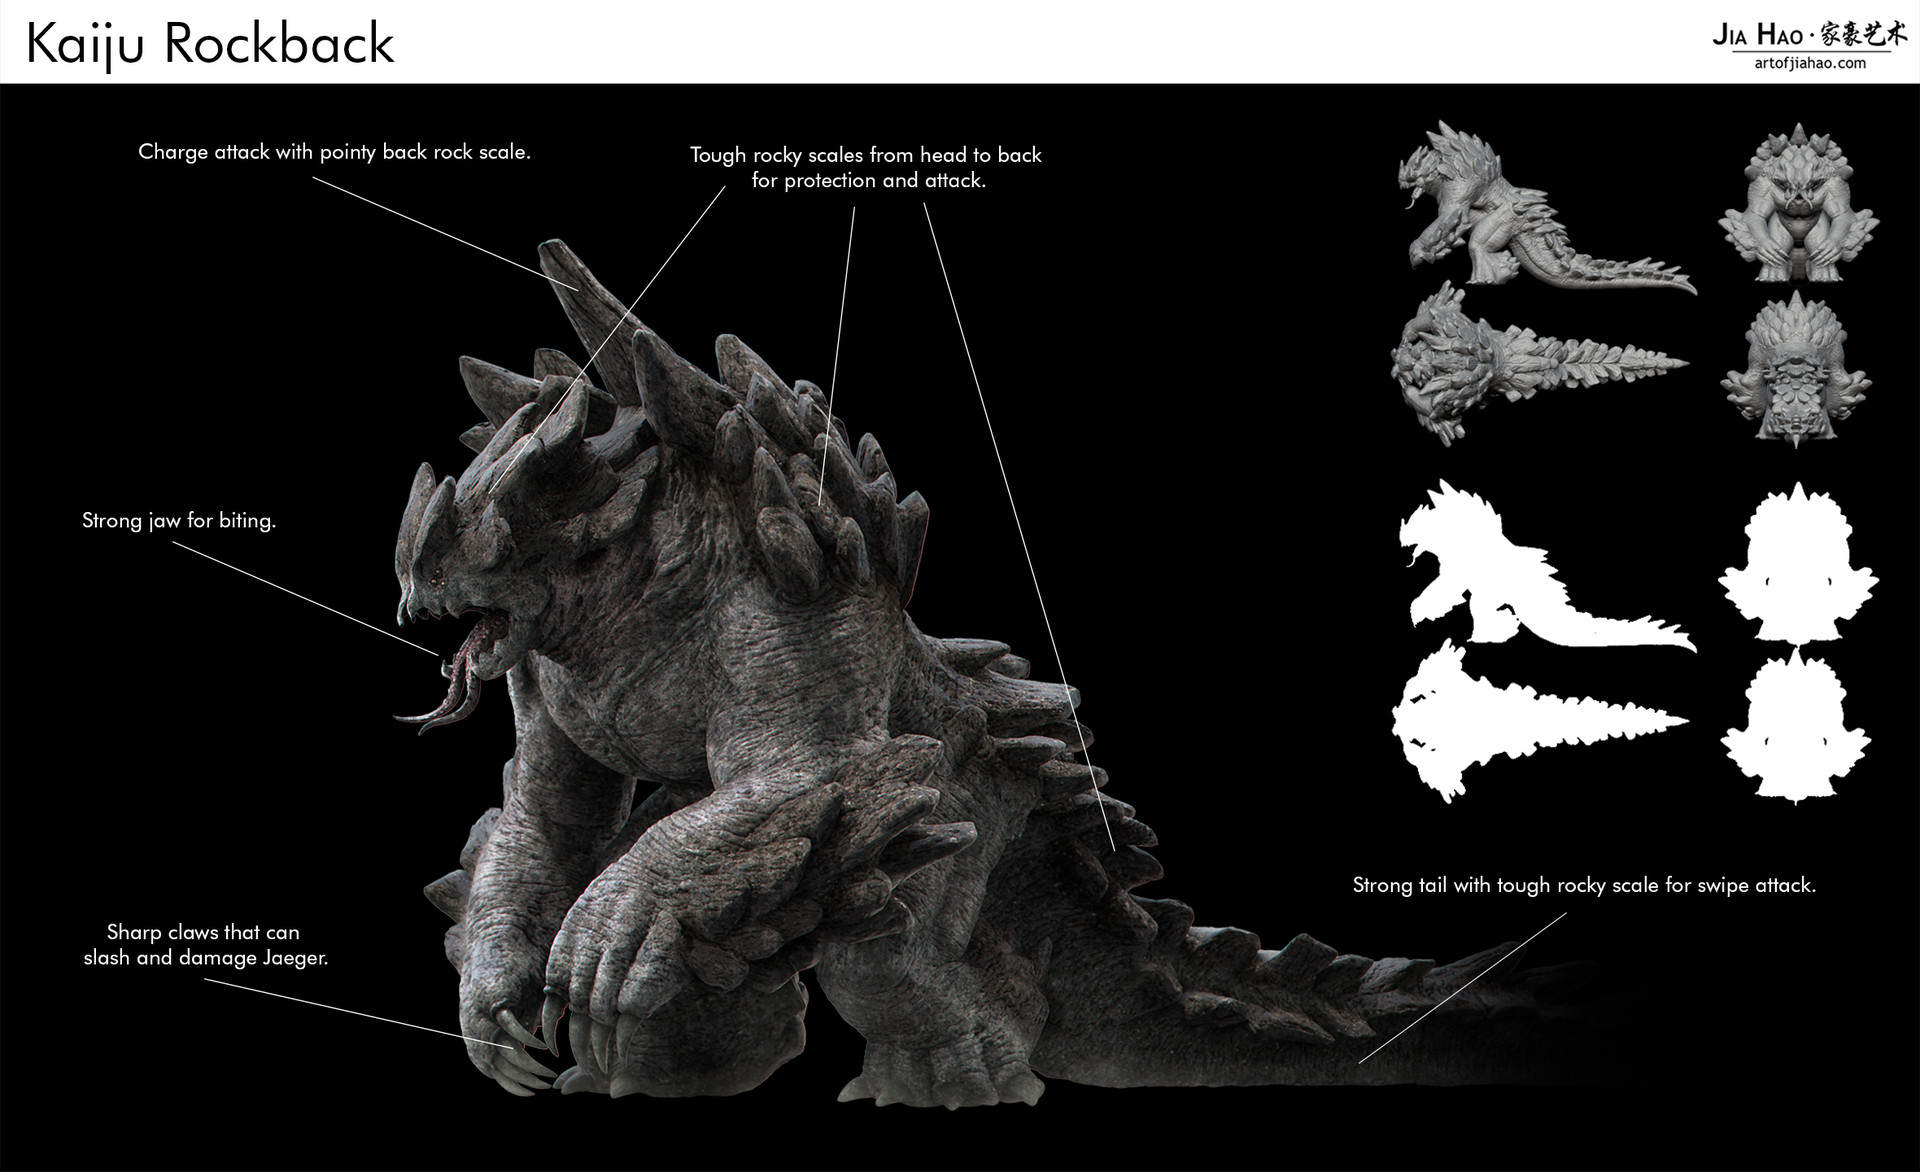 Jia hao 2017 kaiju rockback creaturedesign